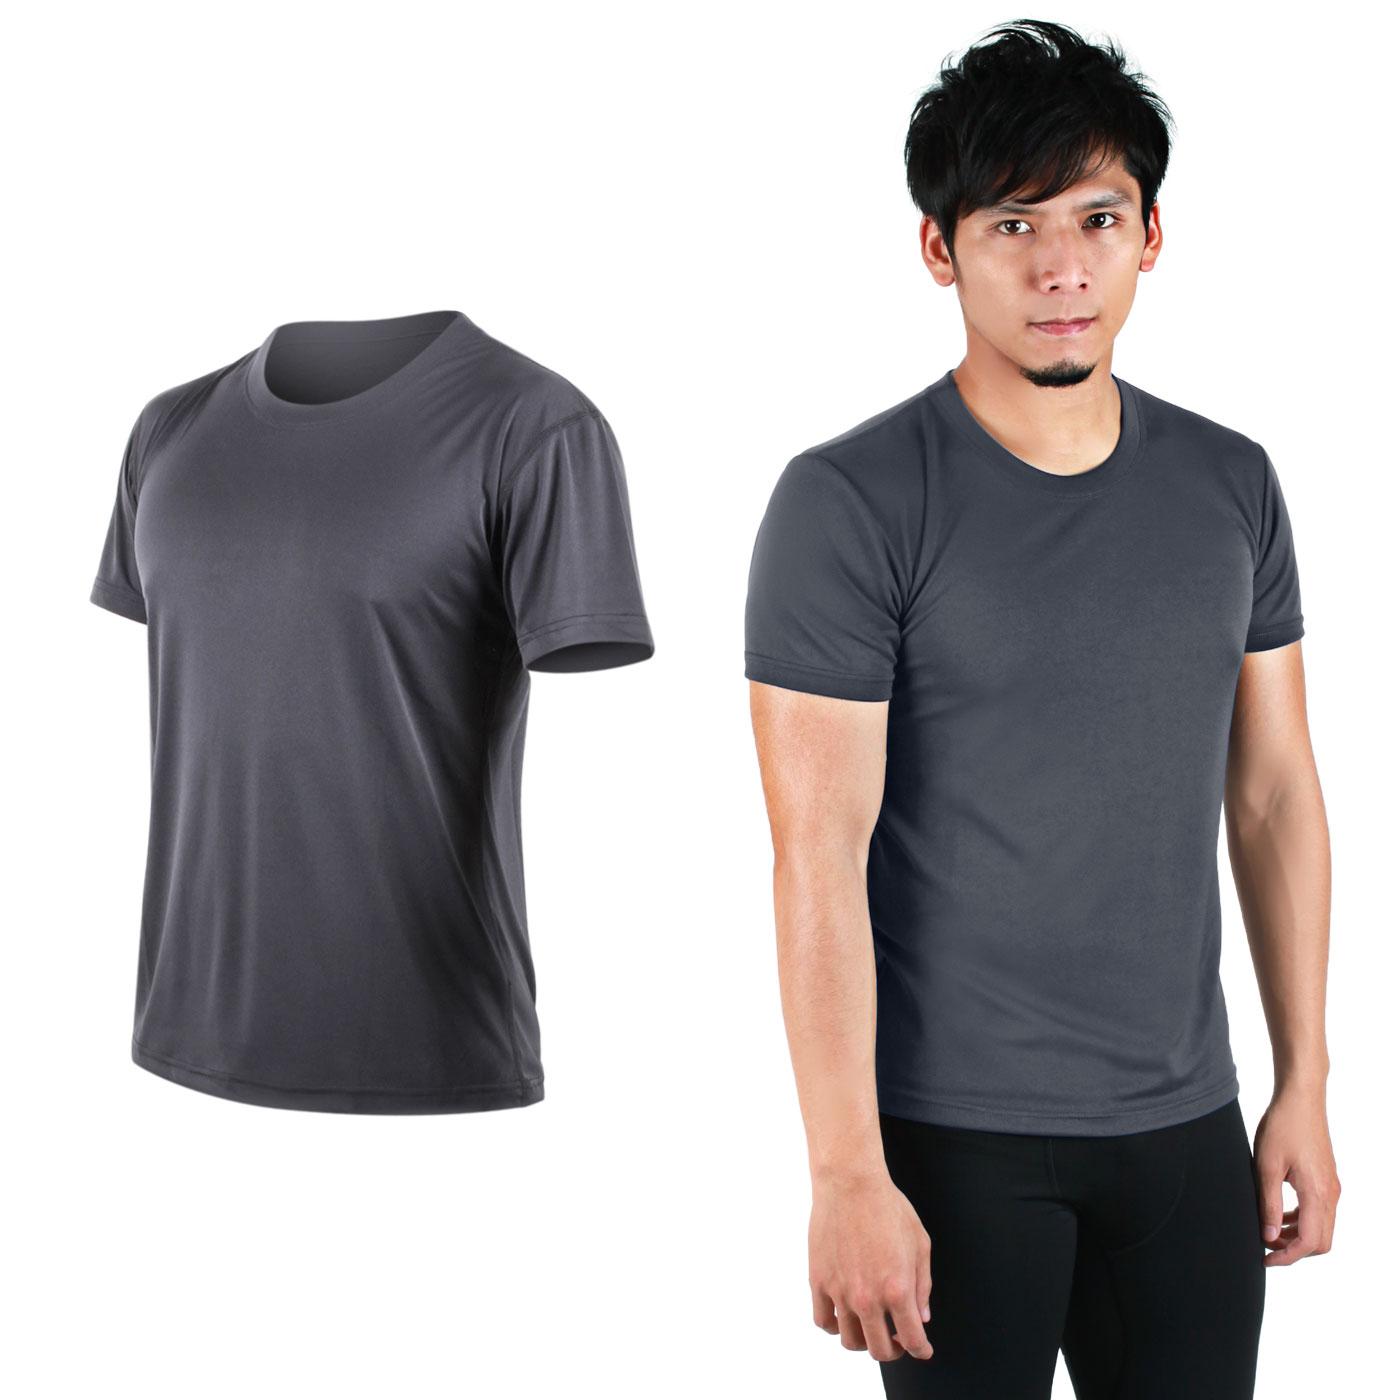 HODARLA FLARE 100 吸濕排汗衫3108301 - 鐵灰